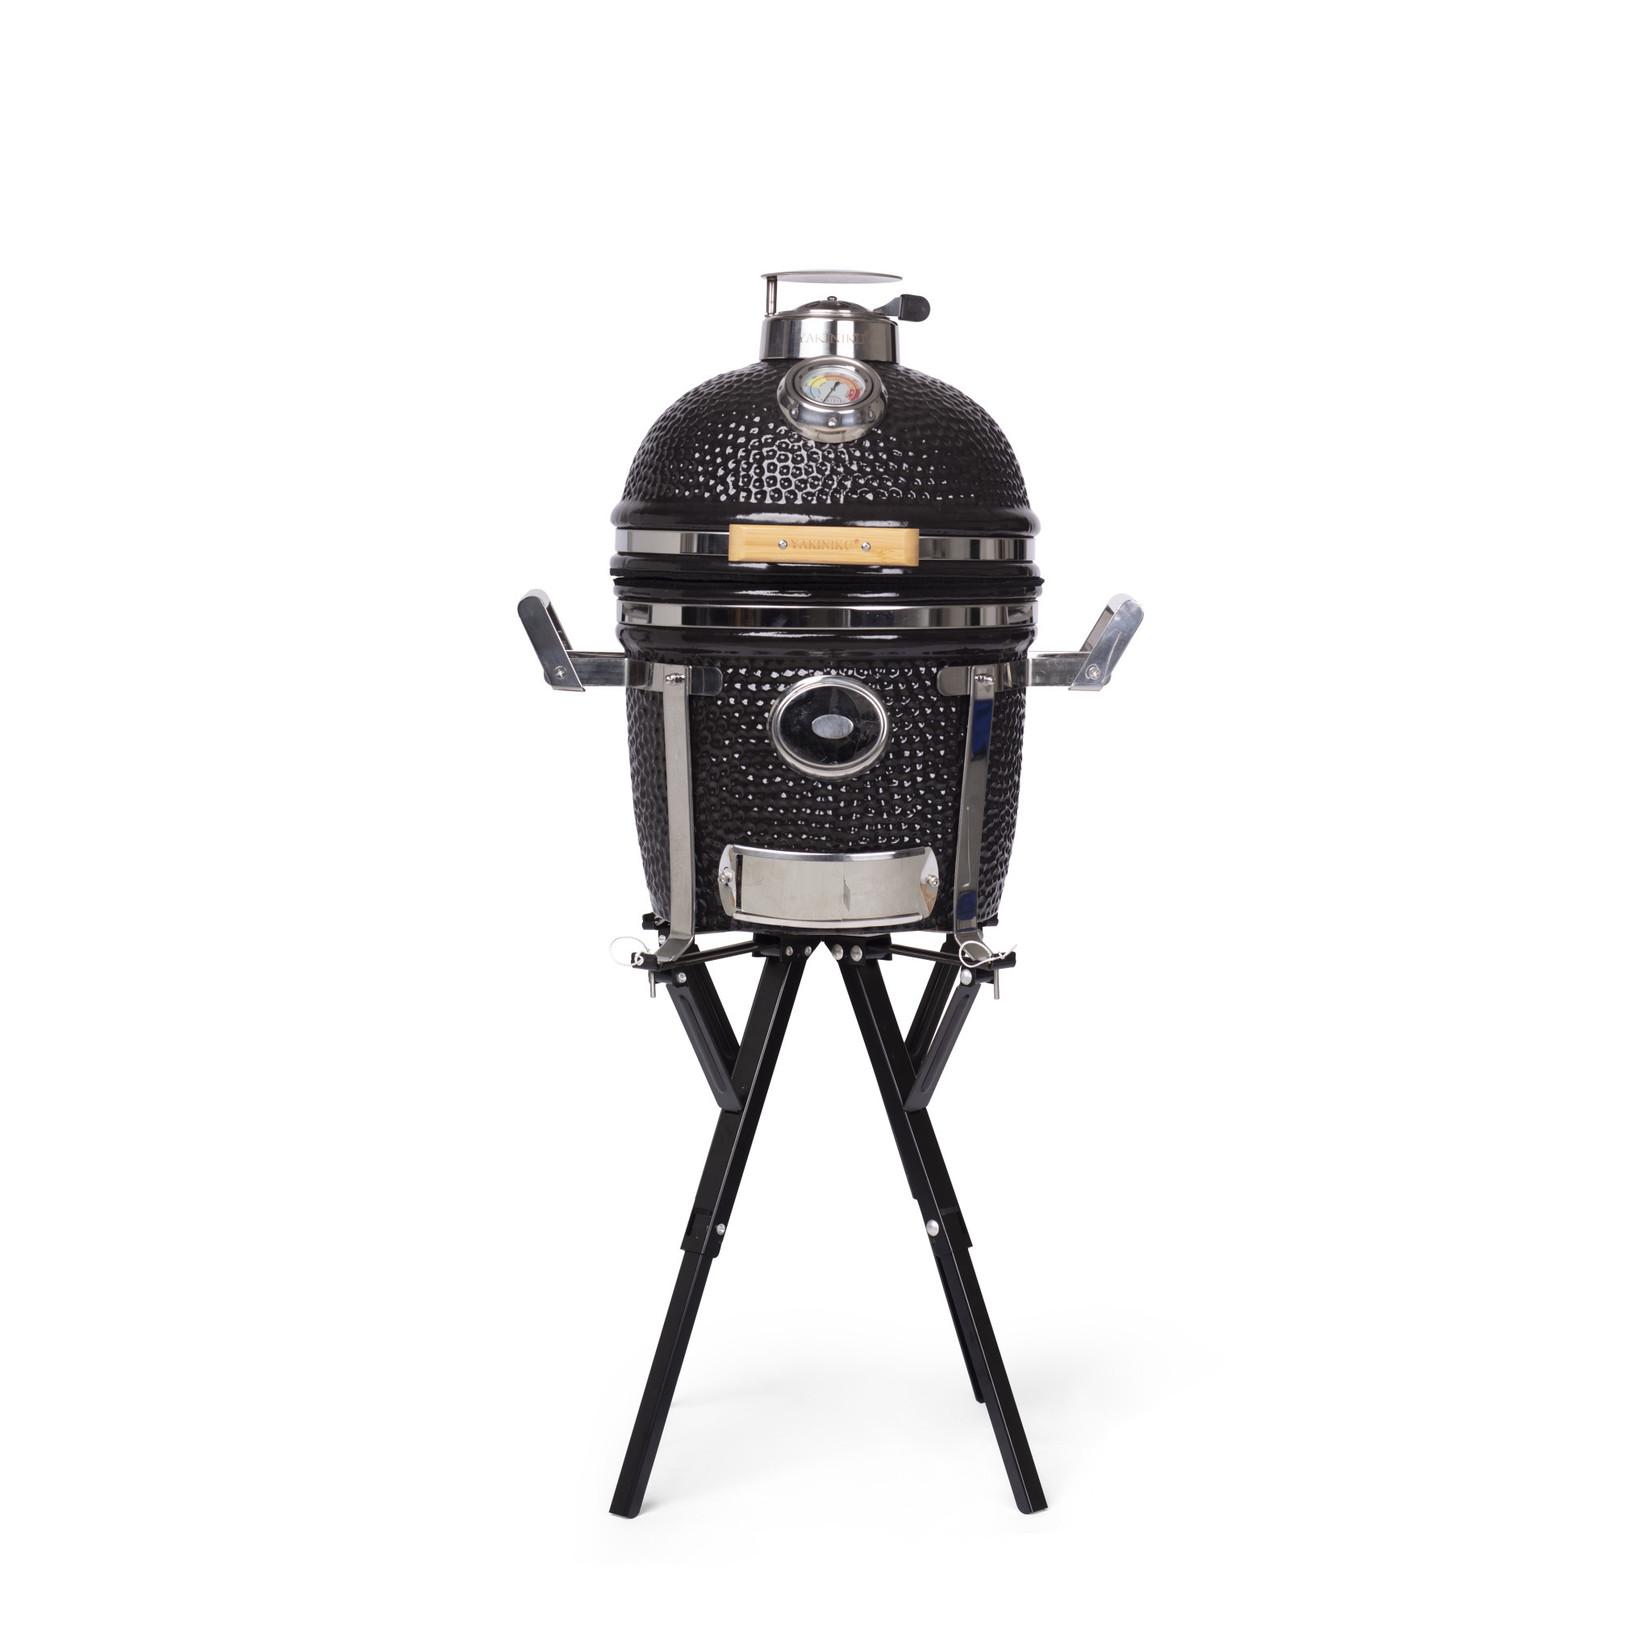 "Yakiniku Yakiniku 13"" compact grill met draagbaar onderstel"